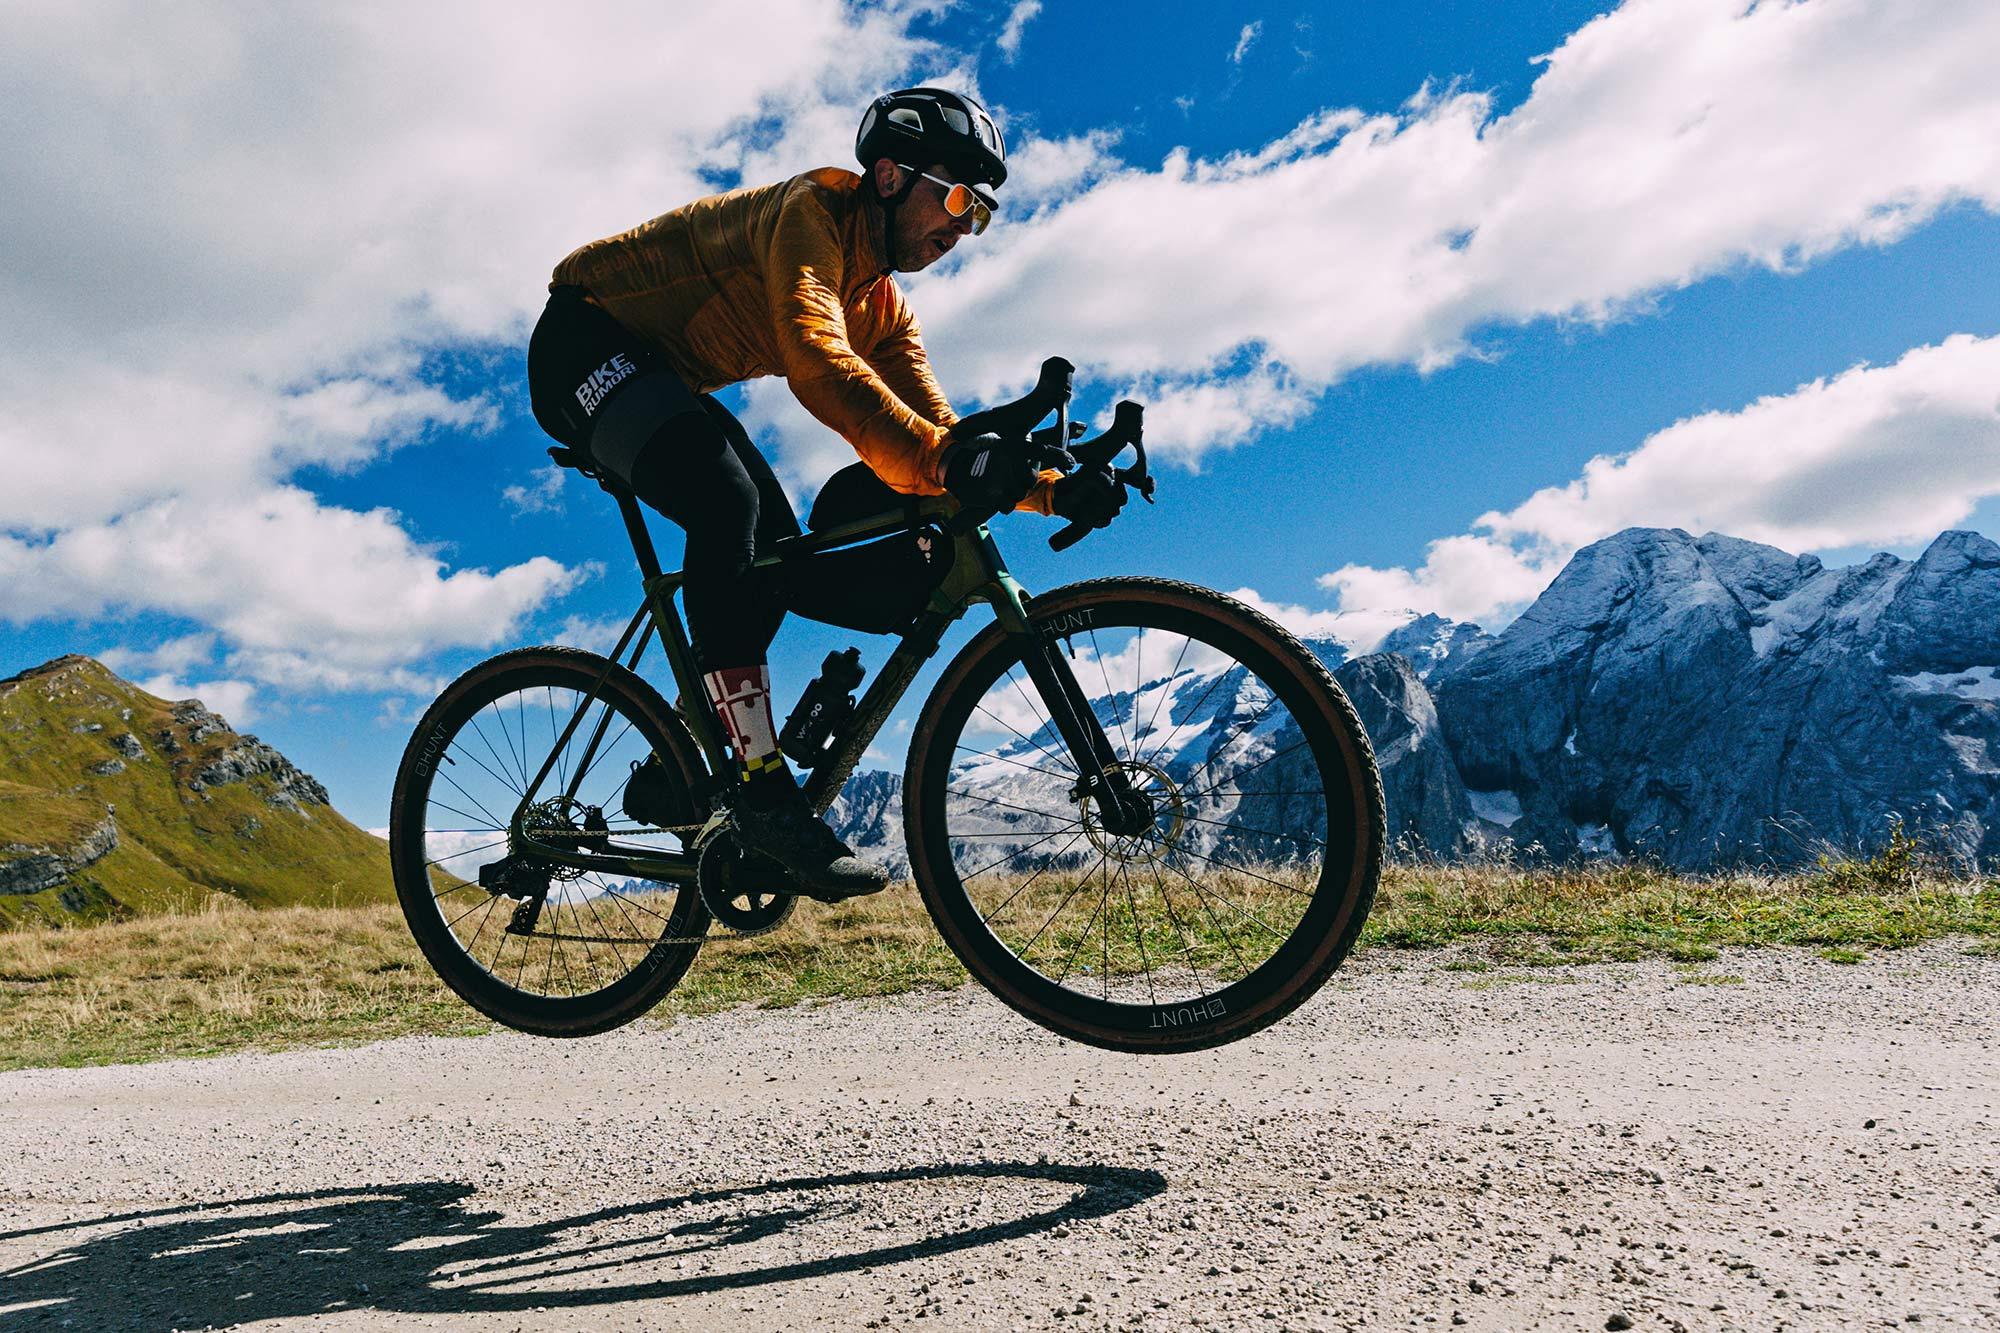 Review: Fast new 2022 Basso Palta II carbon gravel bike review made-in-Italy, photo byFrancesco Bonato, Dolomiti air